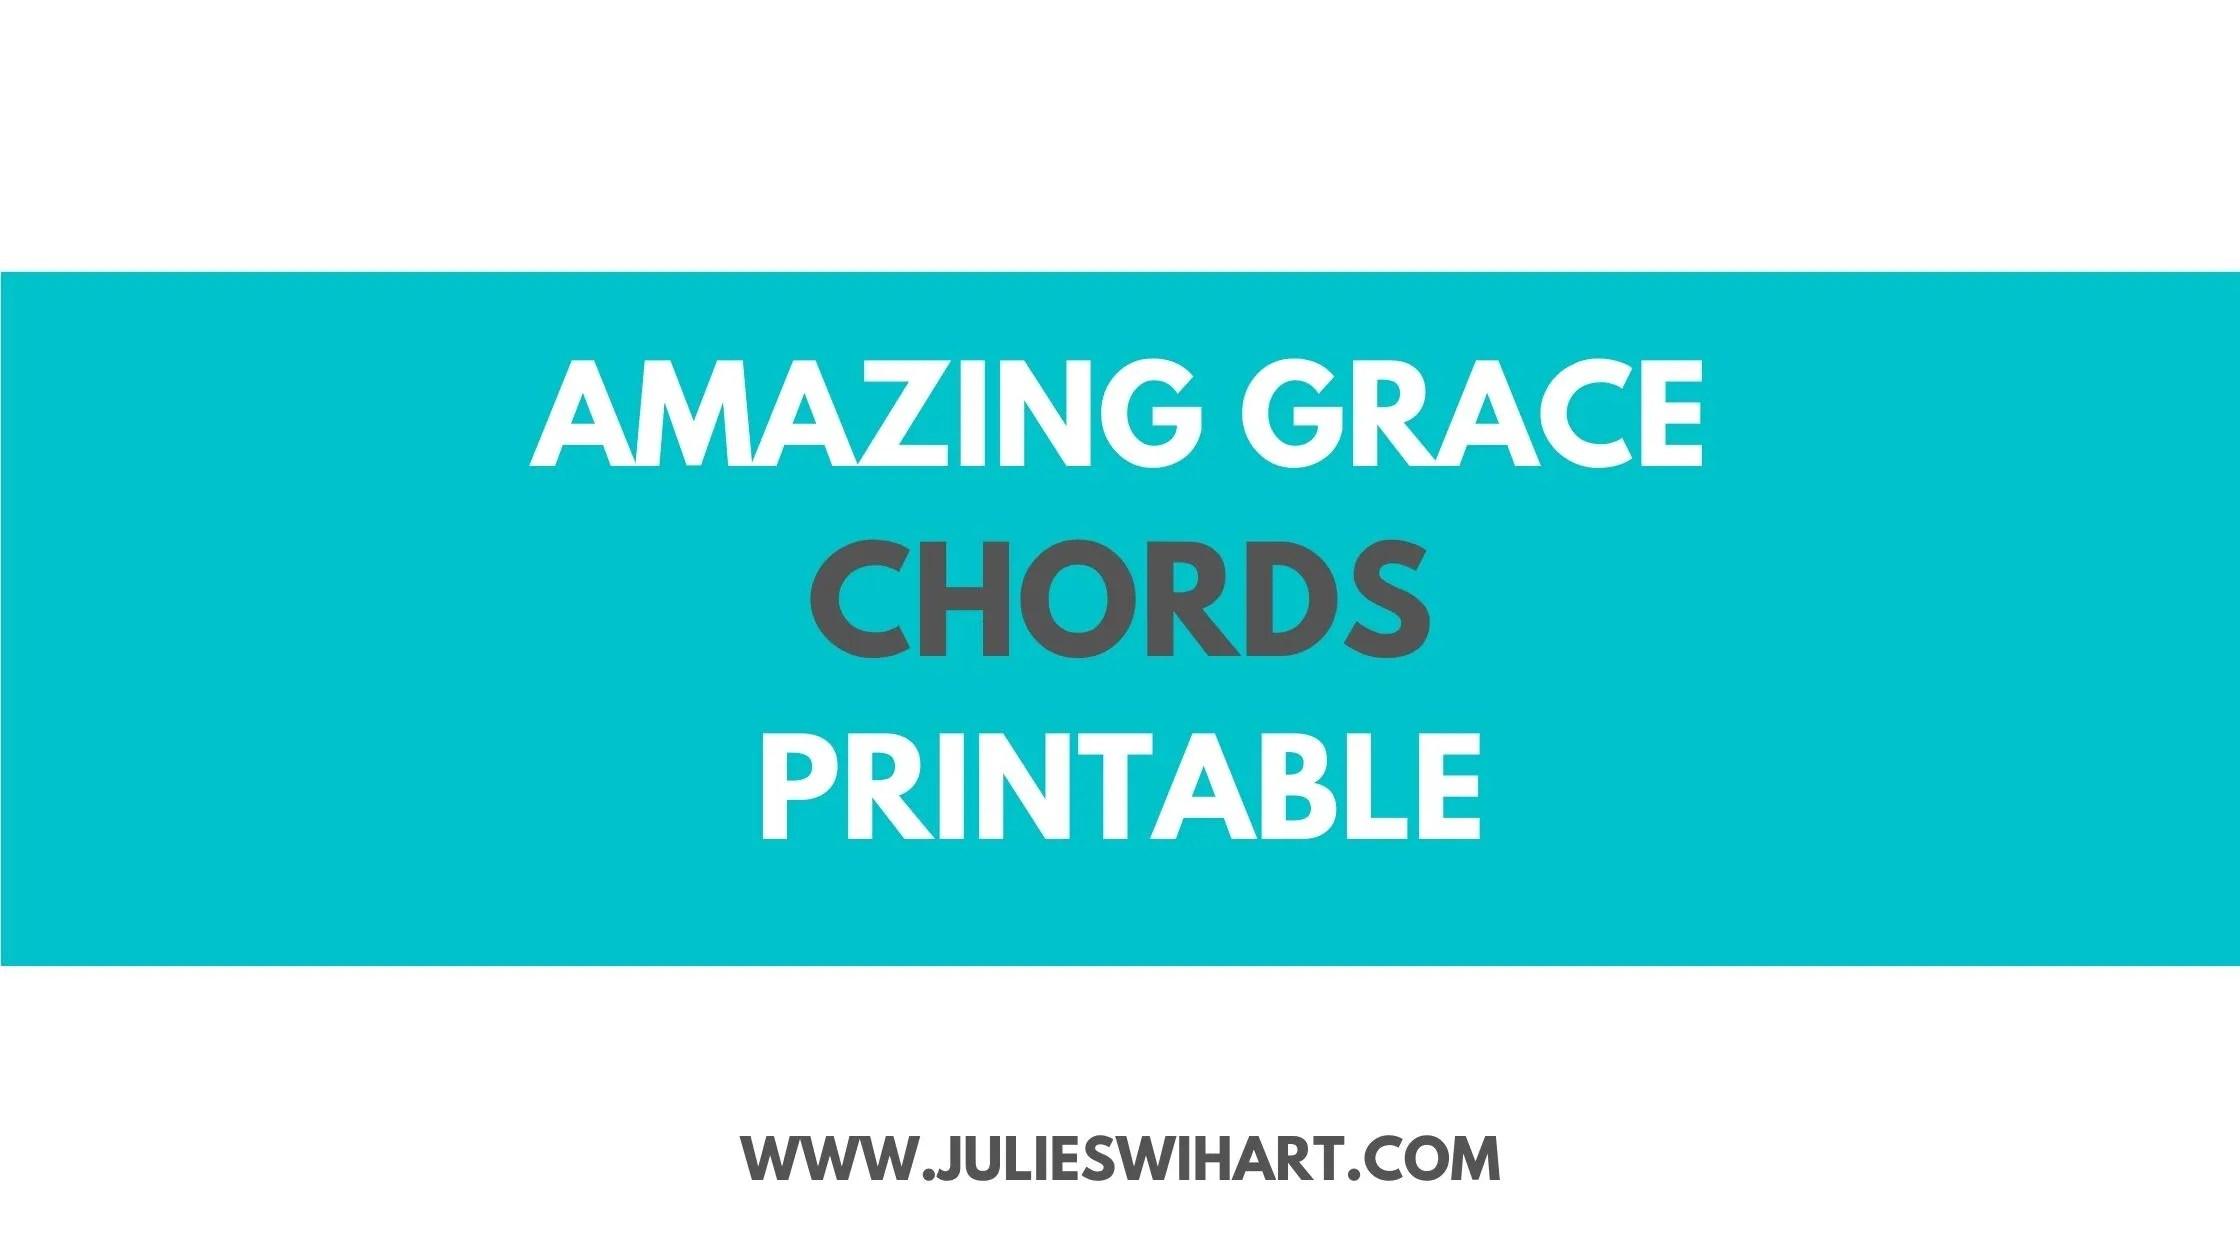 Amazing Grace Chords Printable